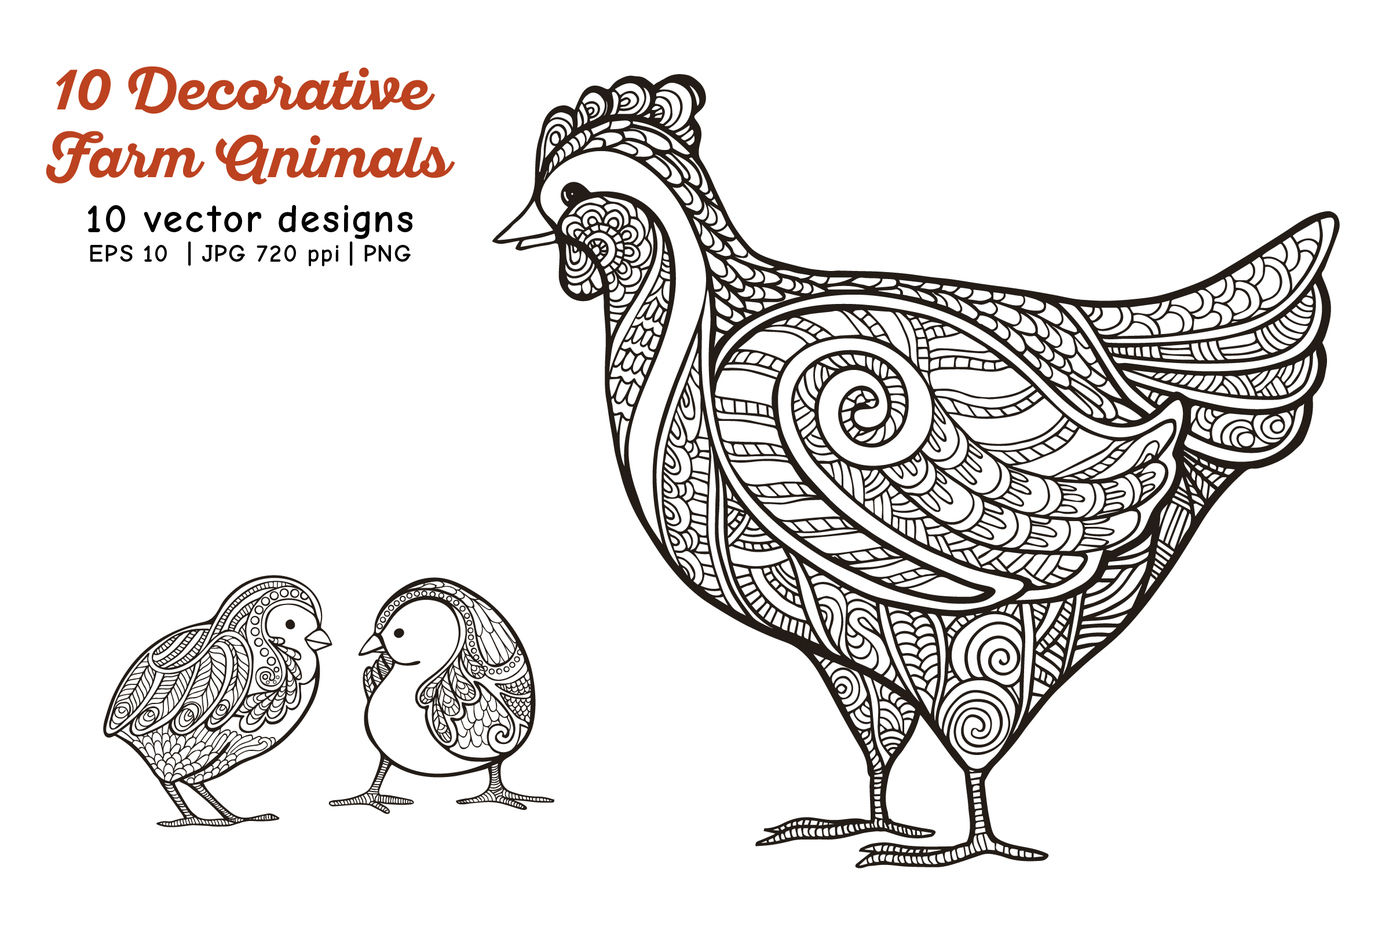 10 Decorative Farm Animals By Elen Lane Thehungryjpeg Com